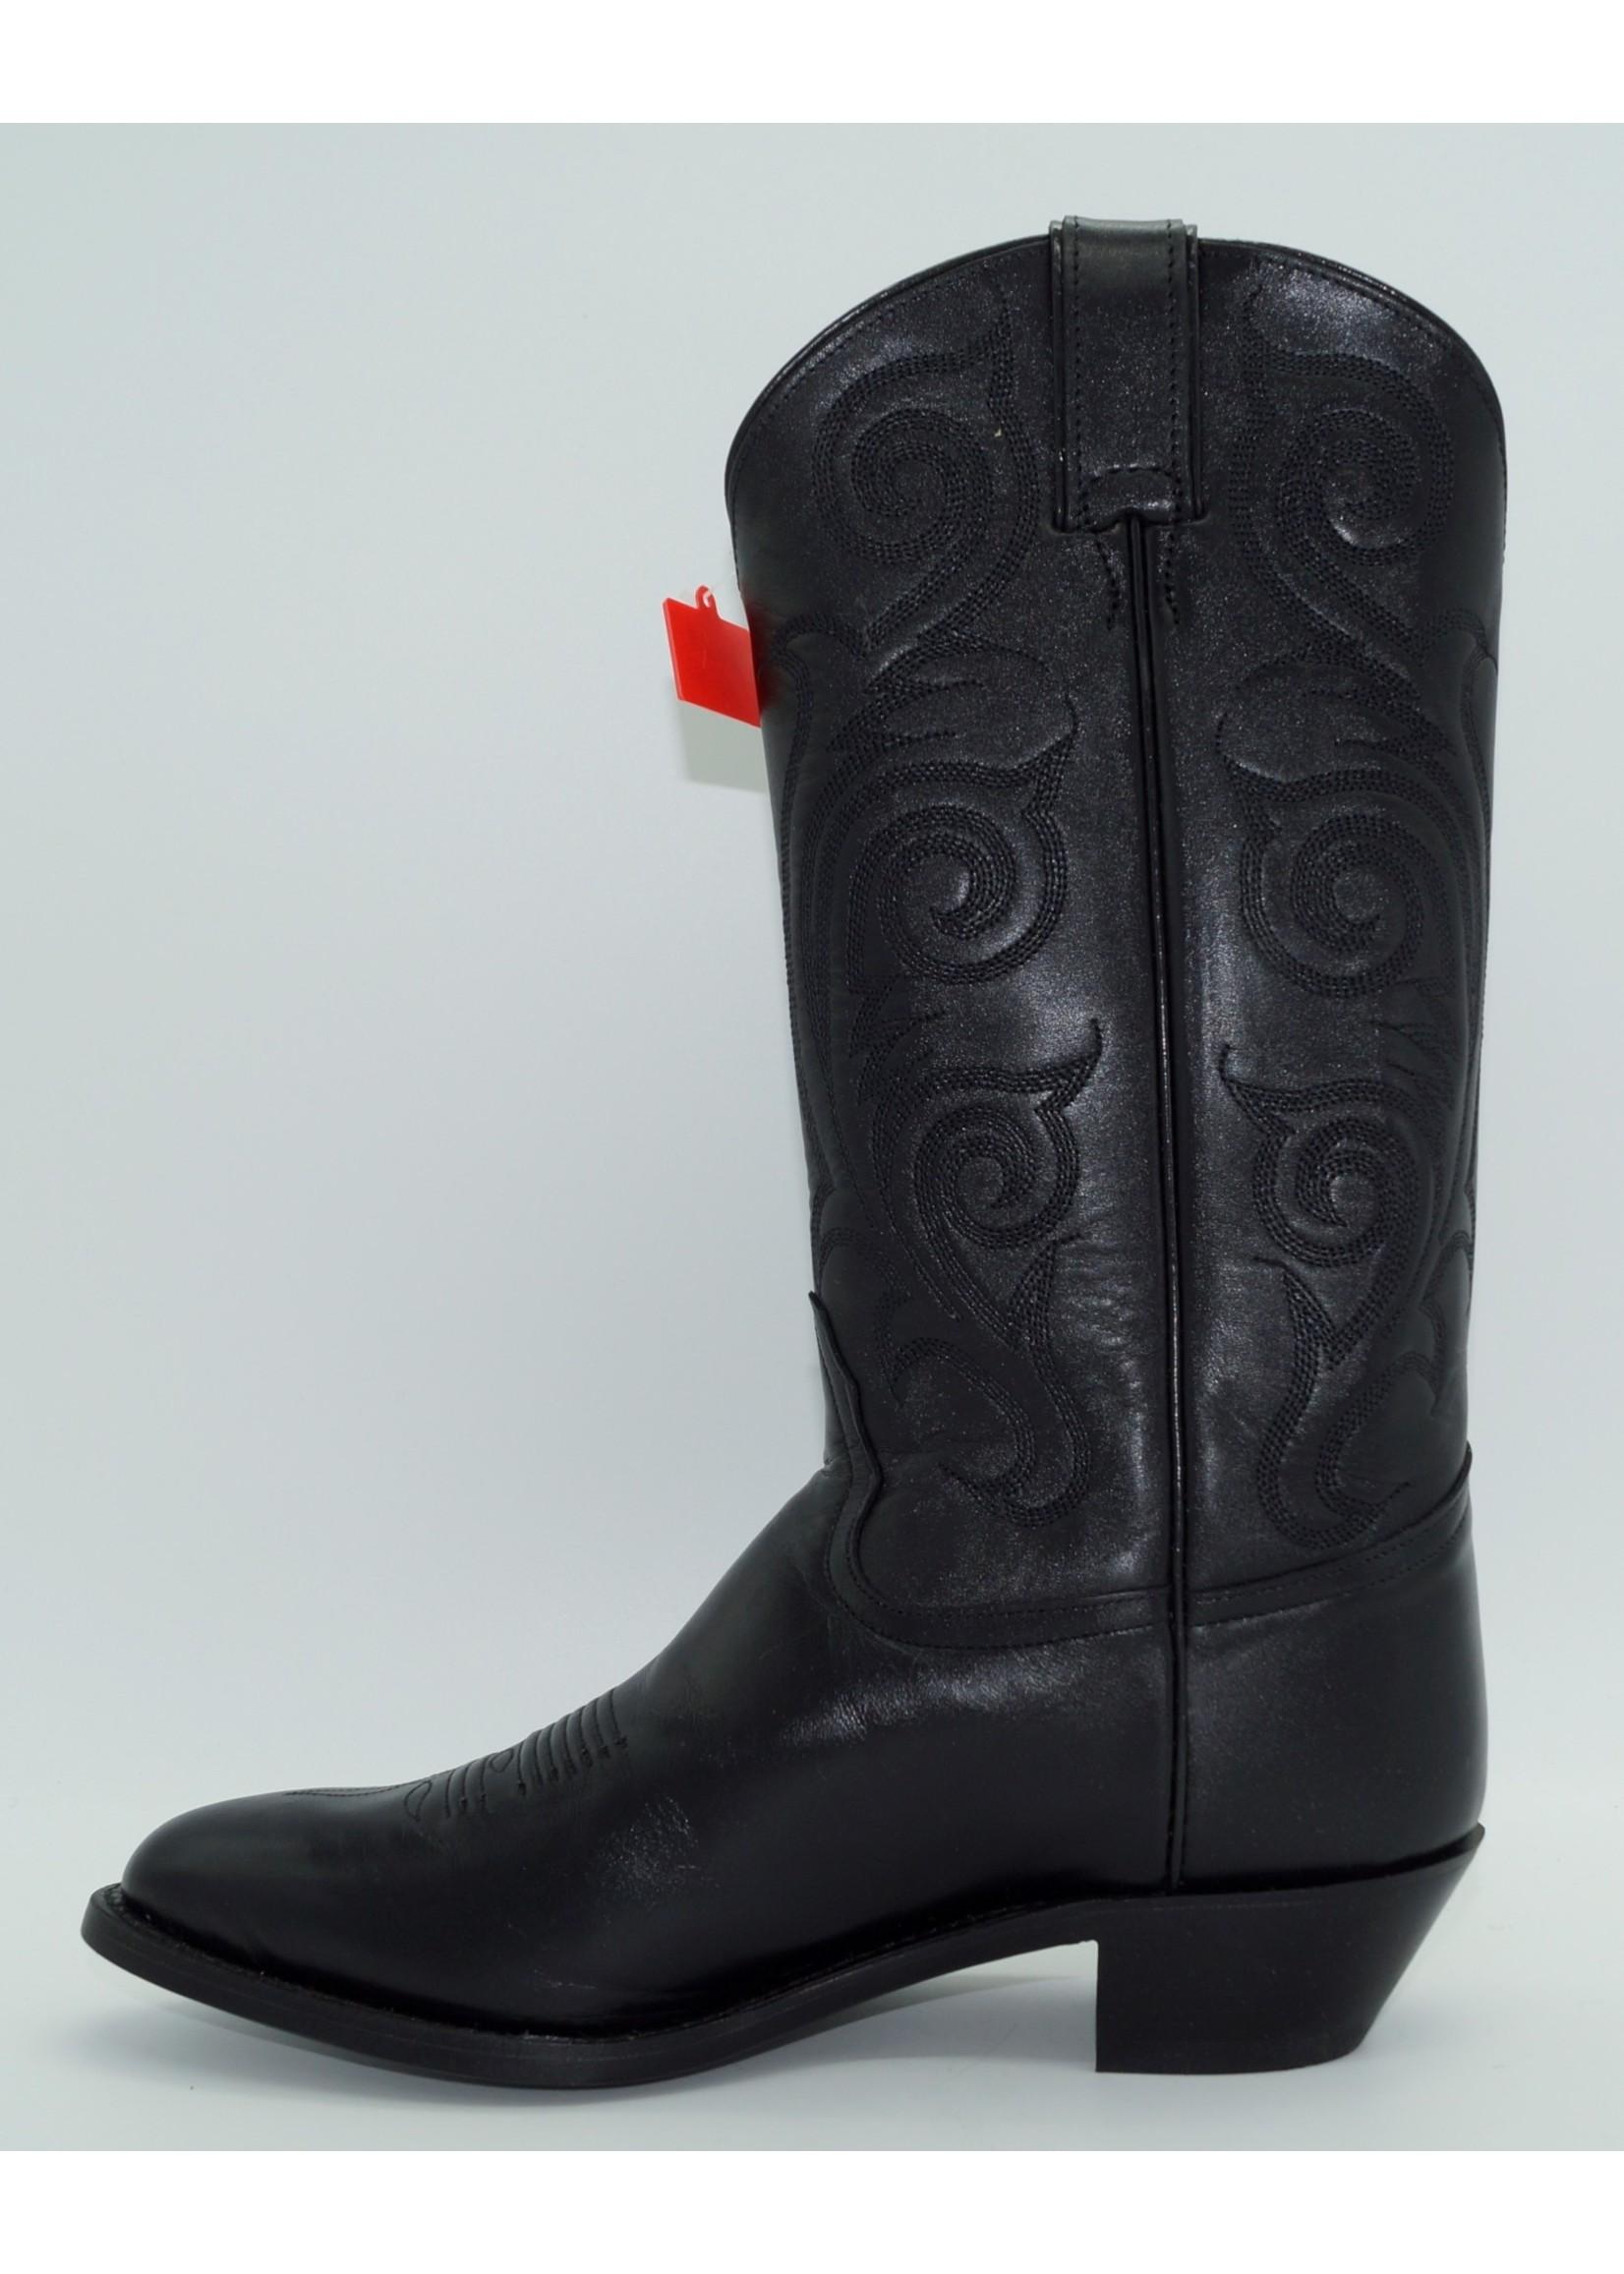 Tony Lama Women's Black Western Dress Boot 1975-LVL1972